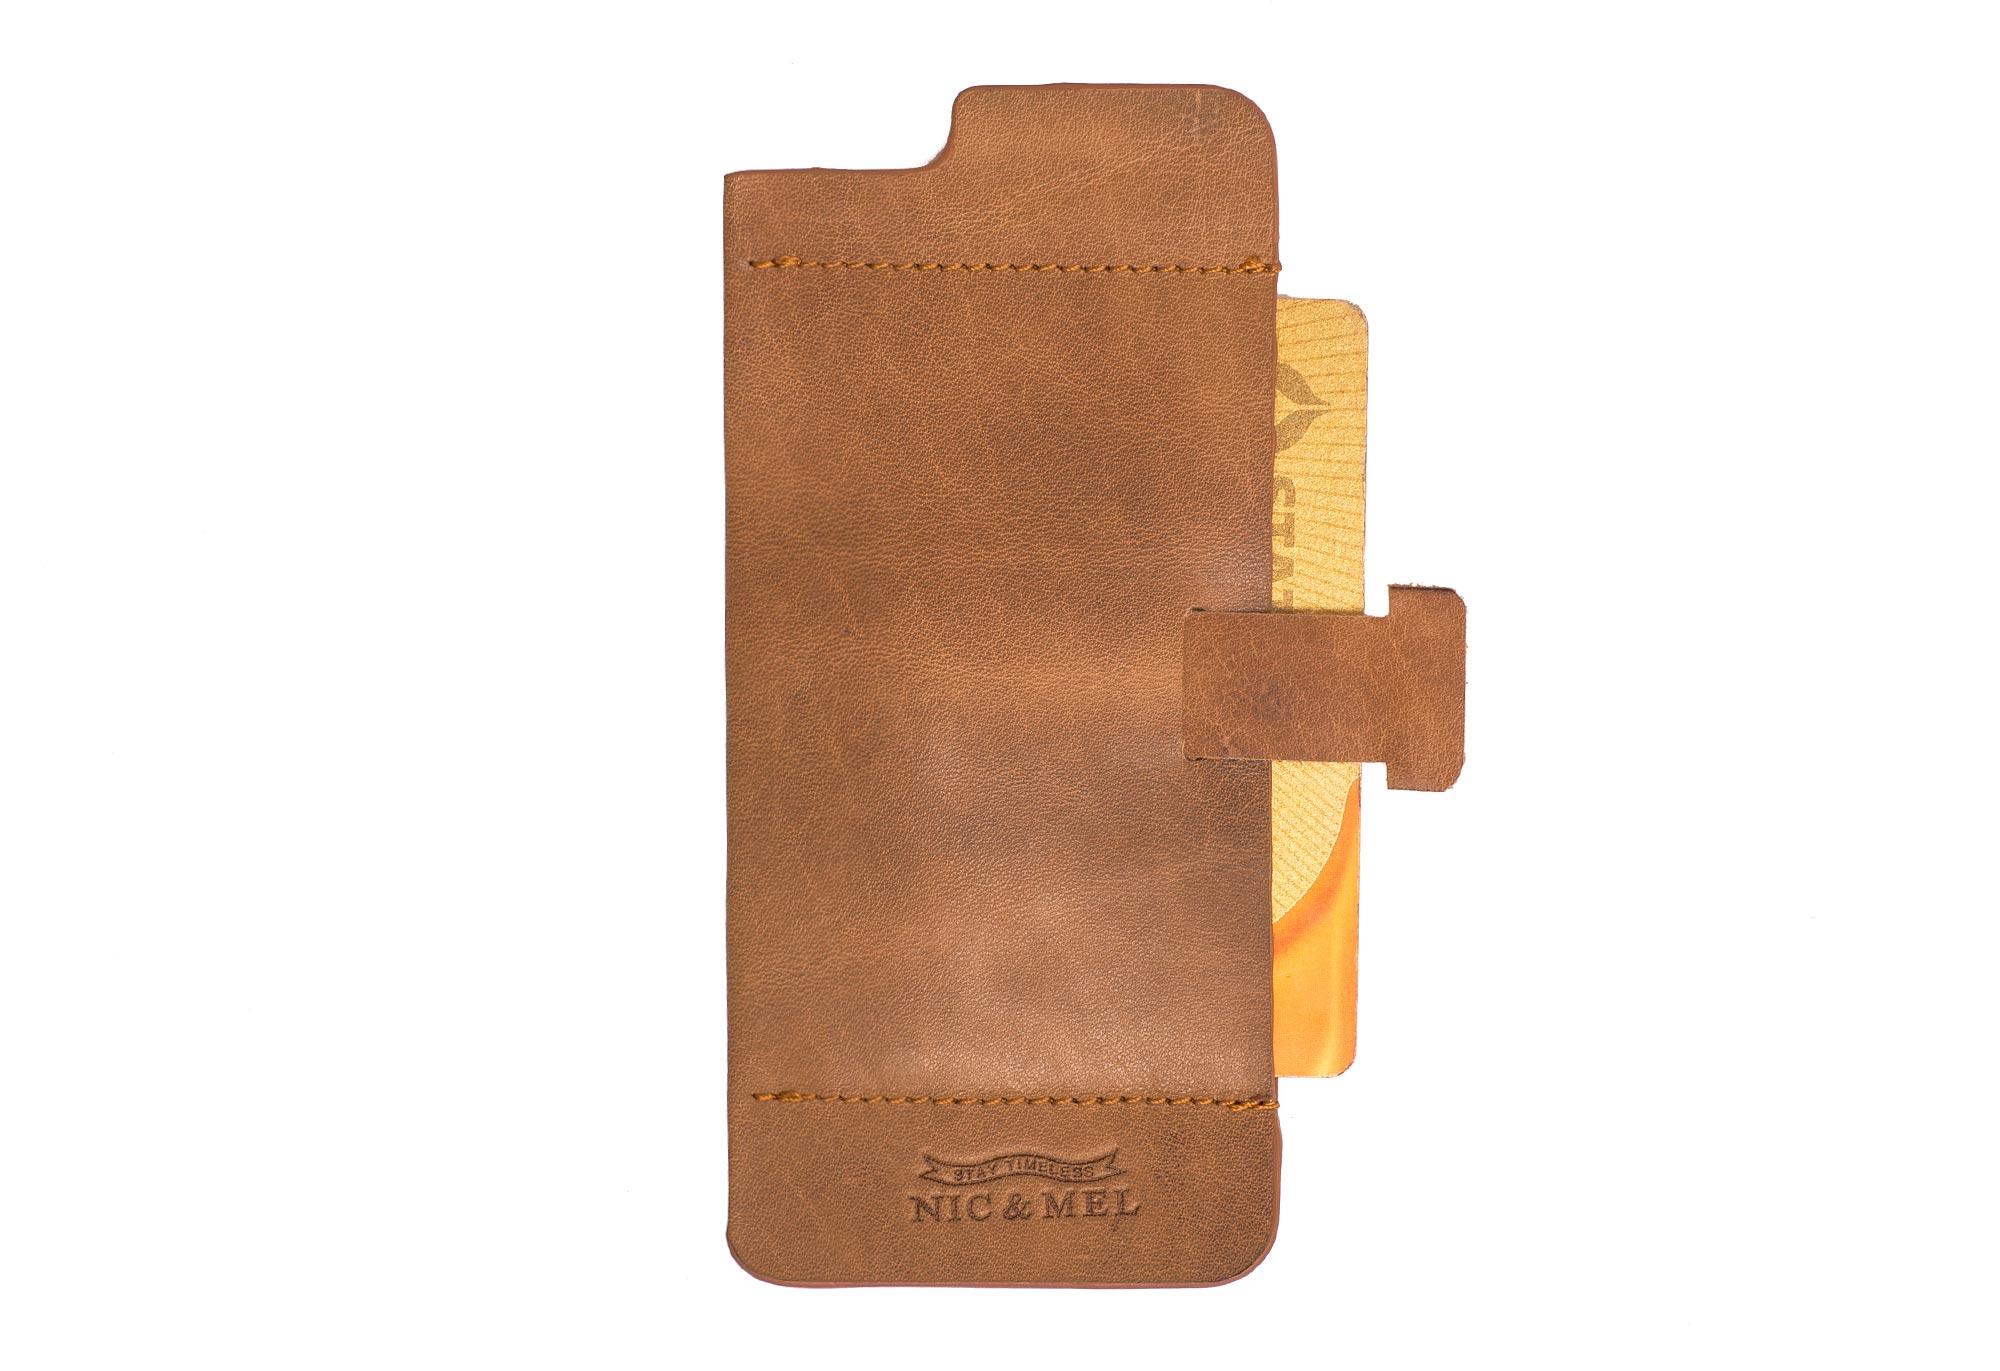 Floyd-adhesive-cognac-card